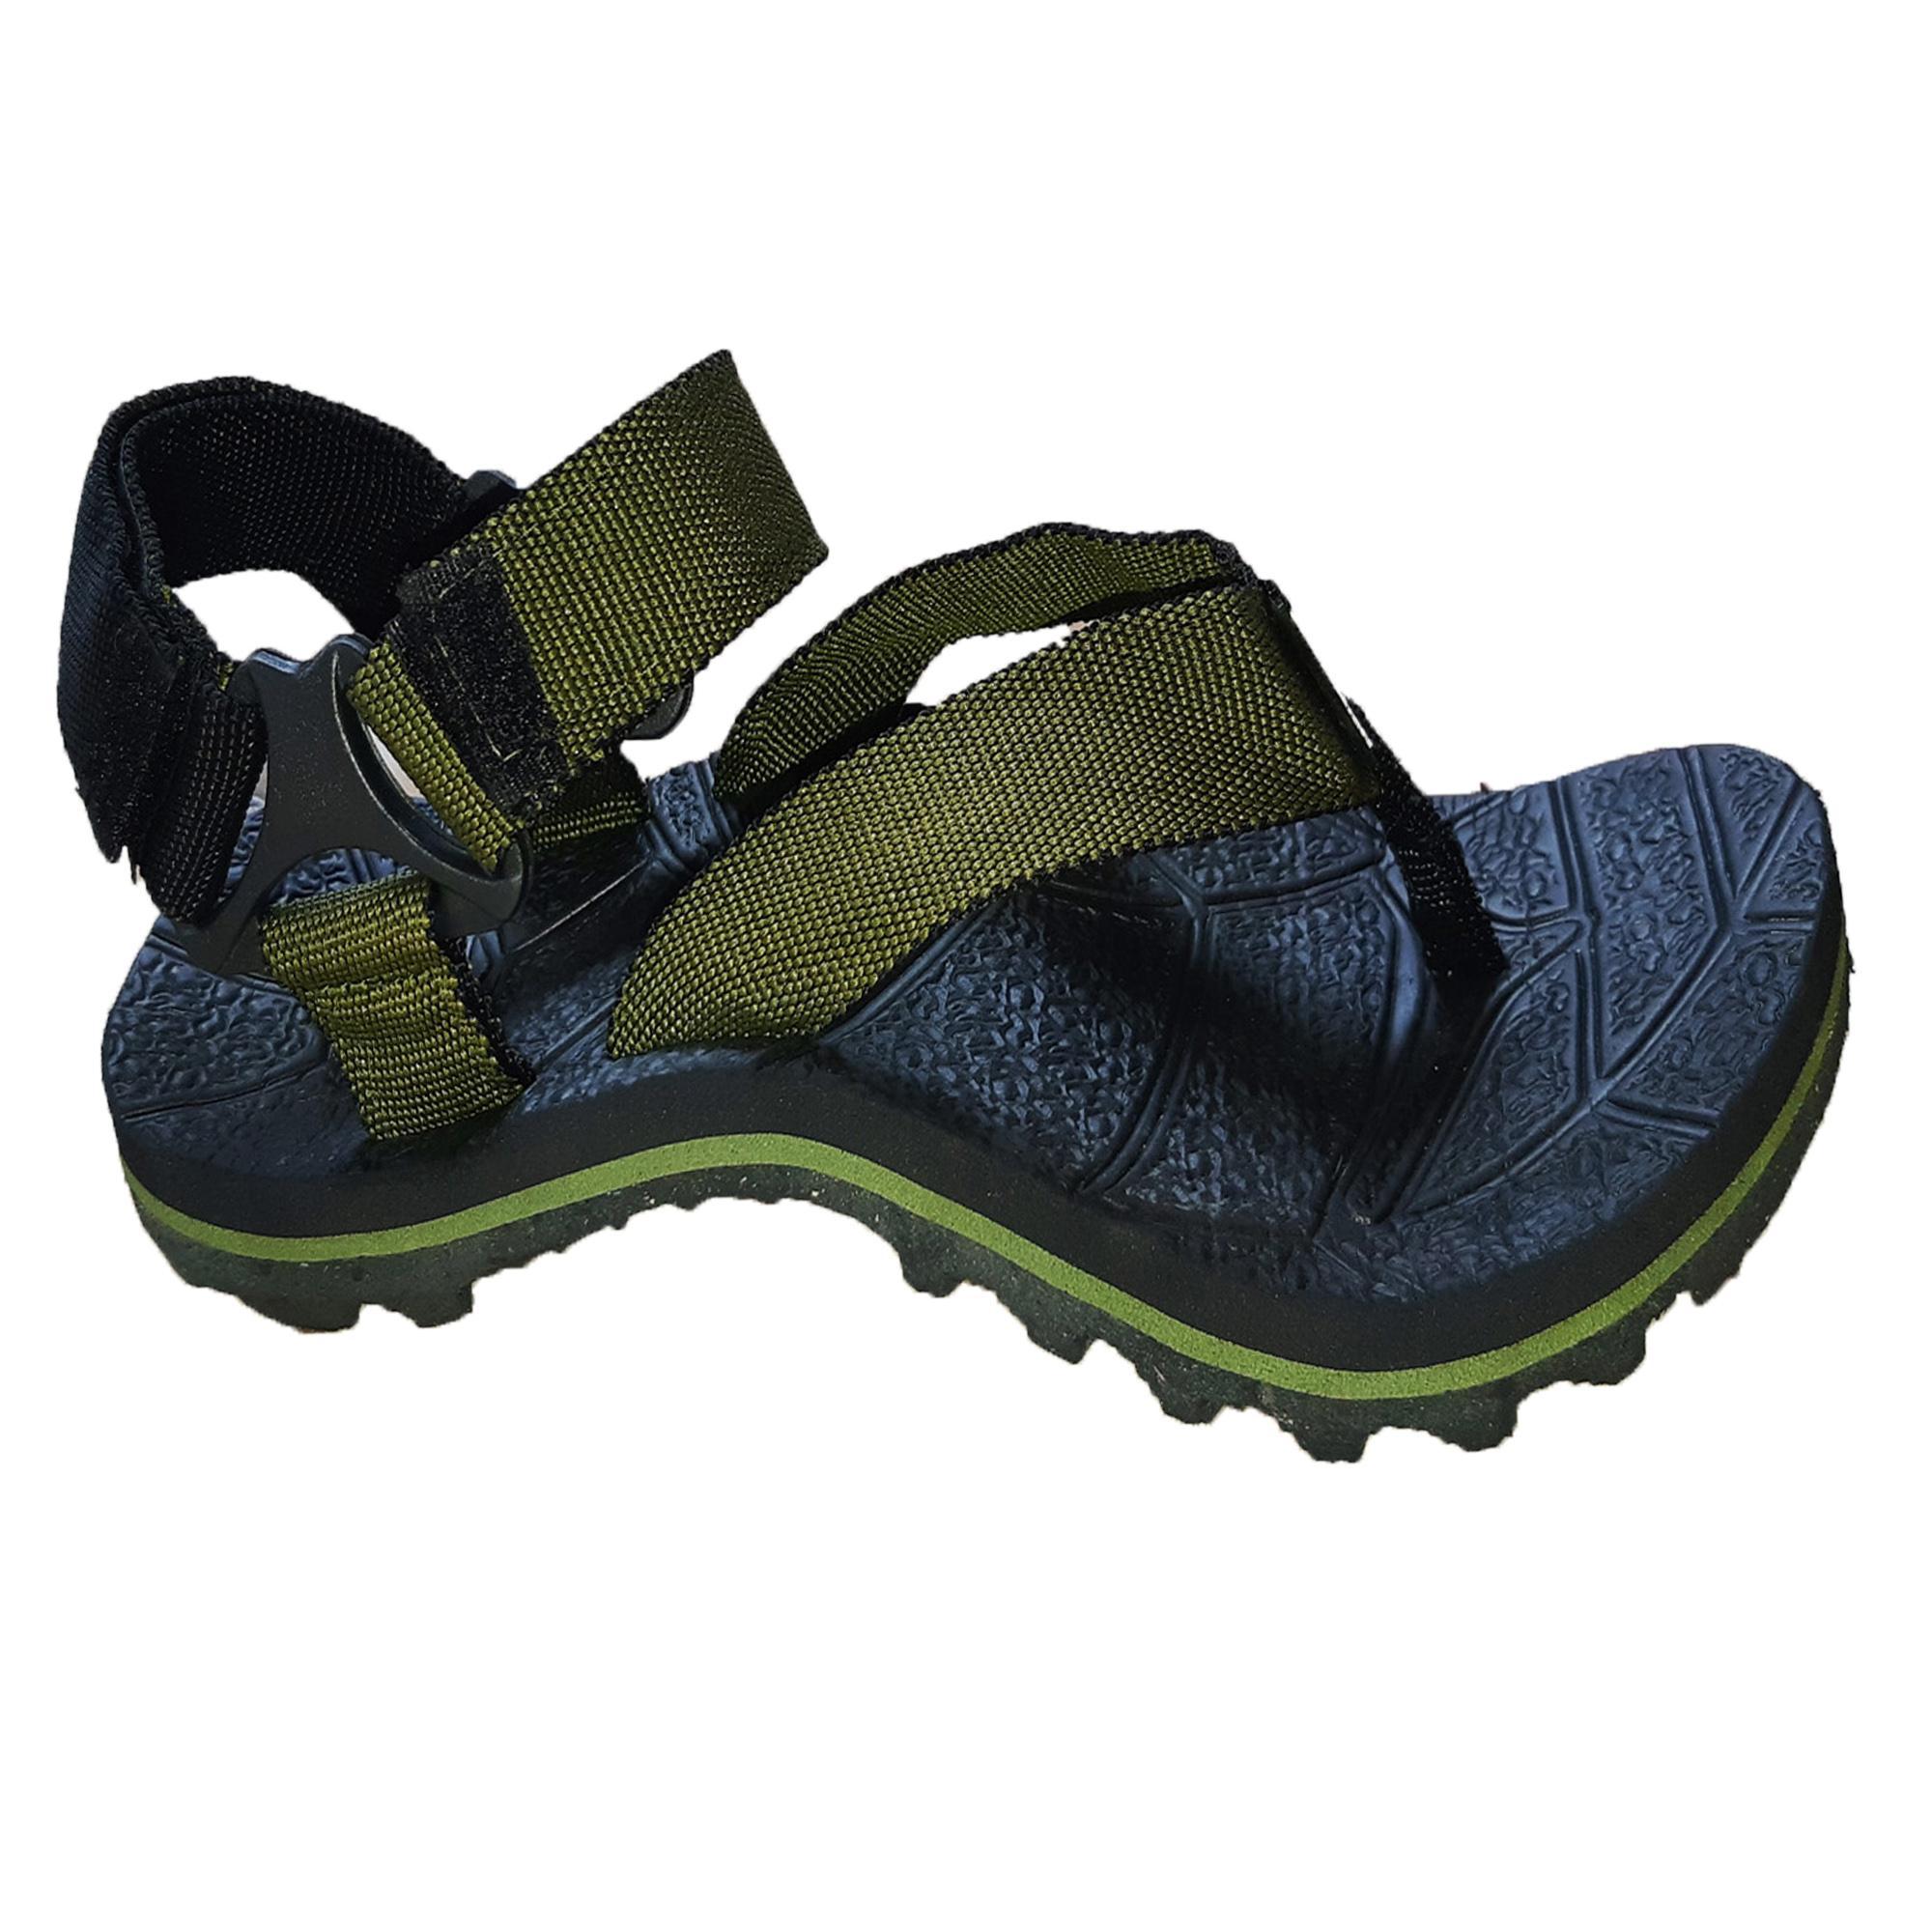 Sepatu Sandal Gunung Anak anak Zahira - BMB003 - Army